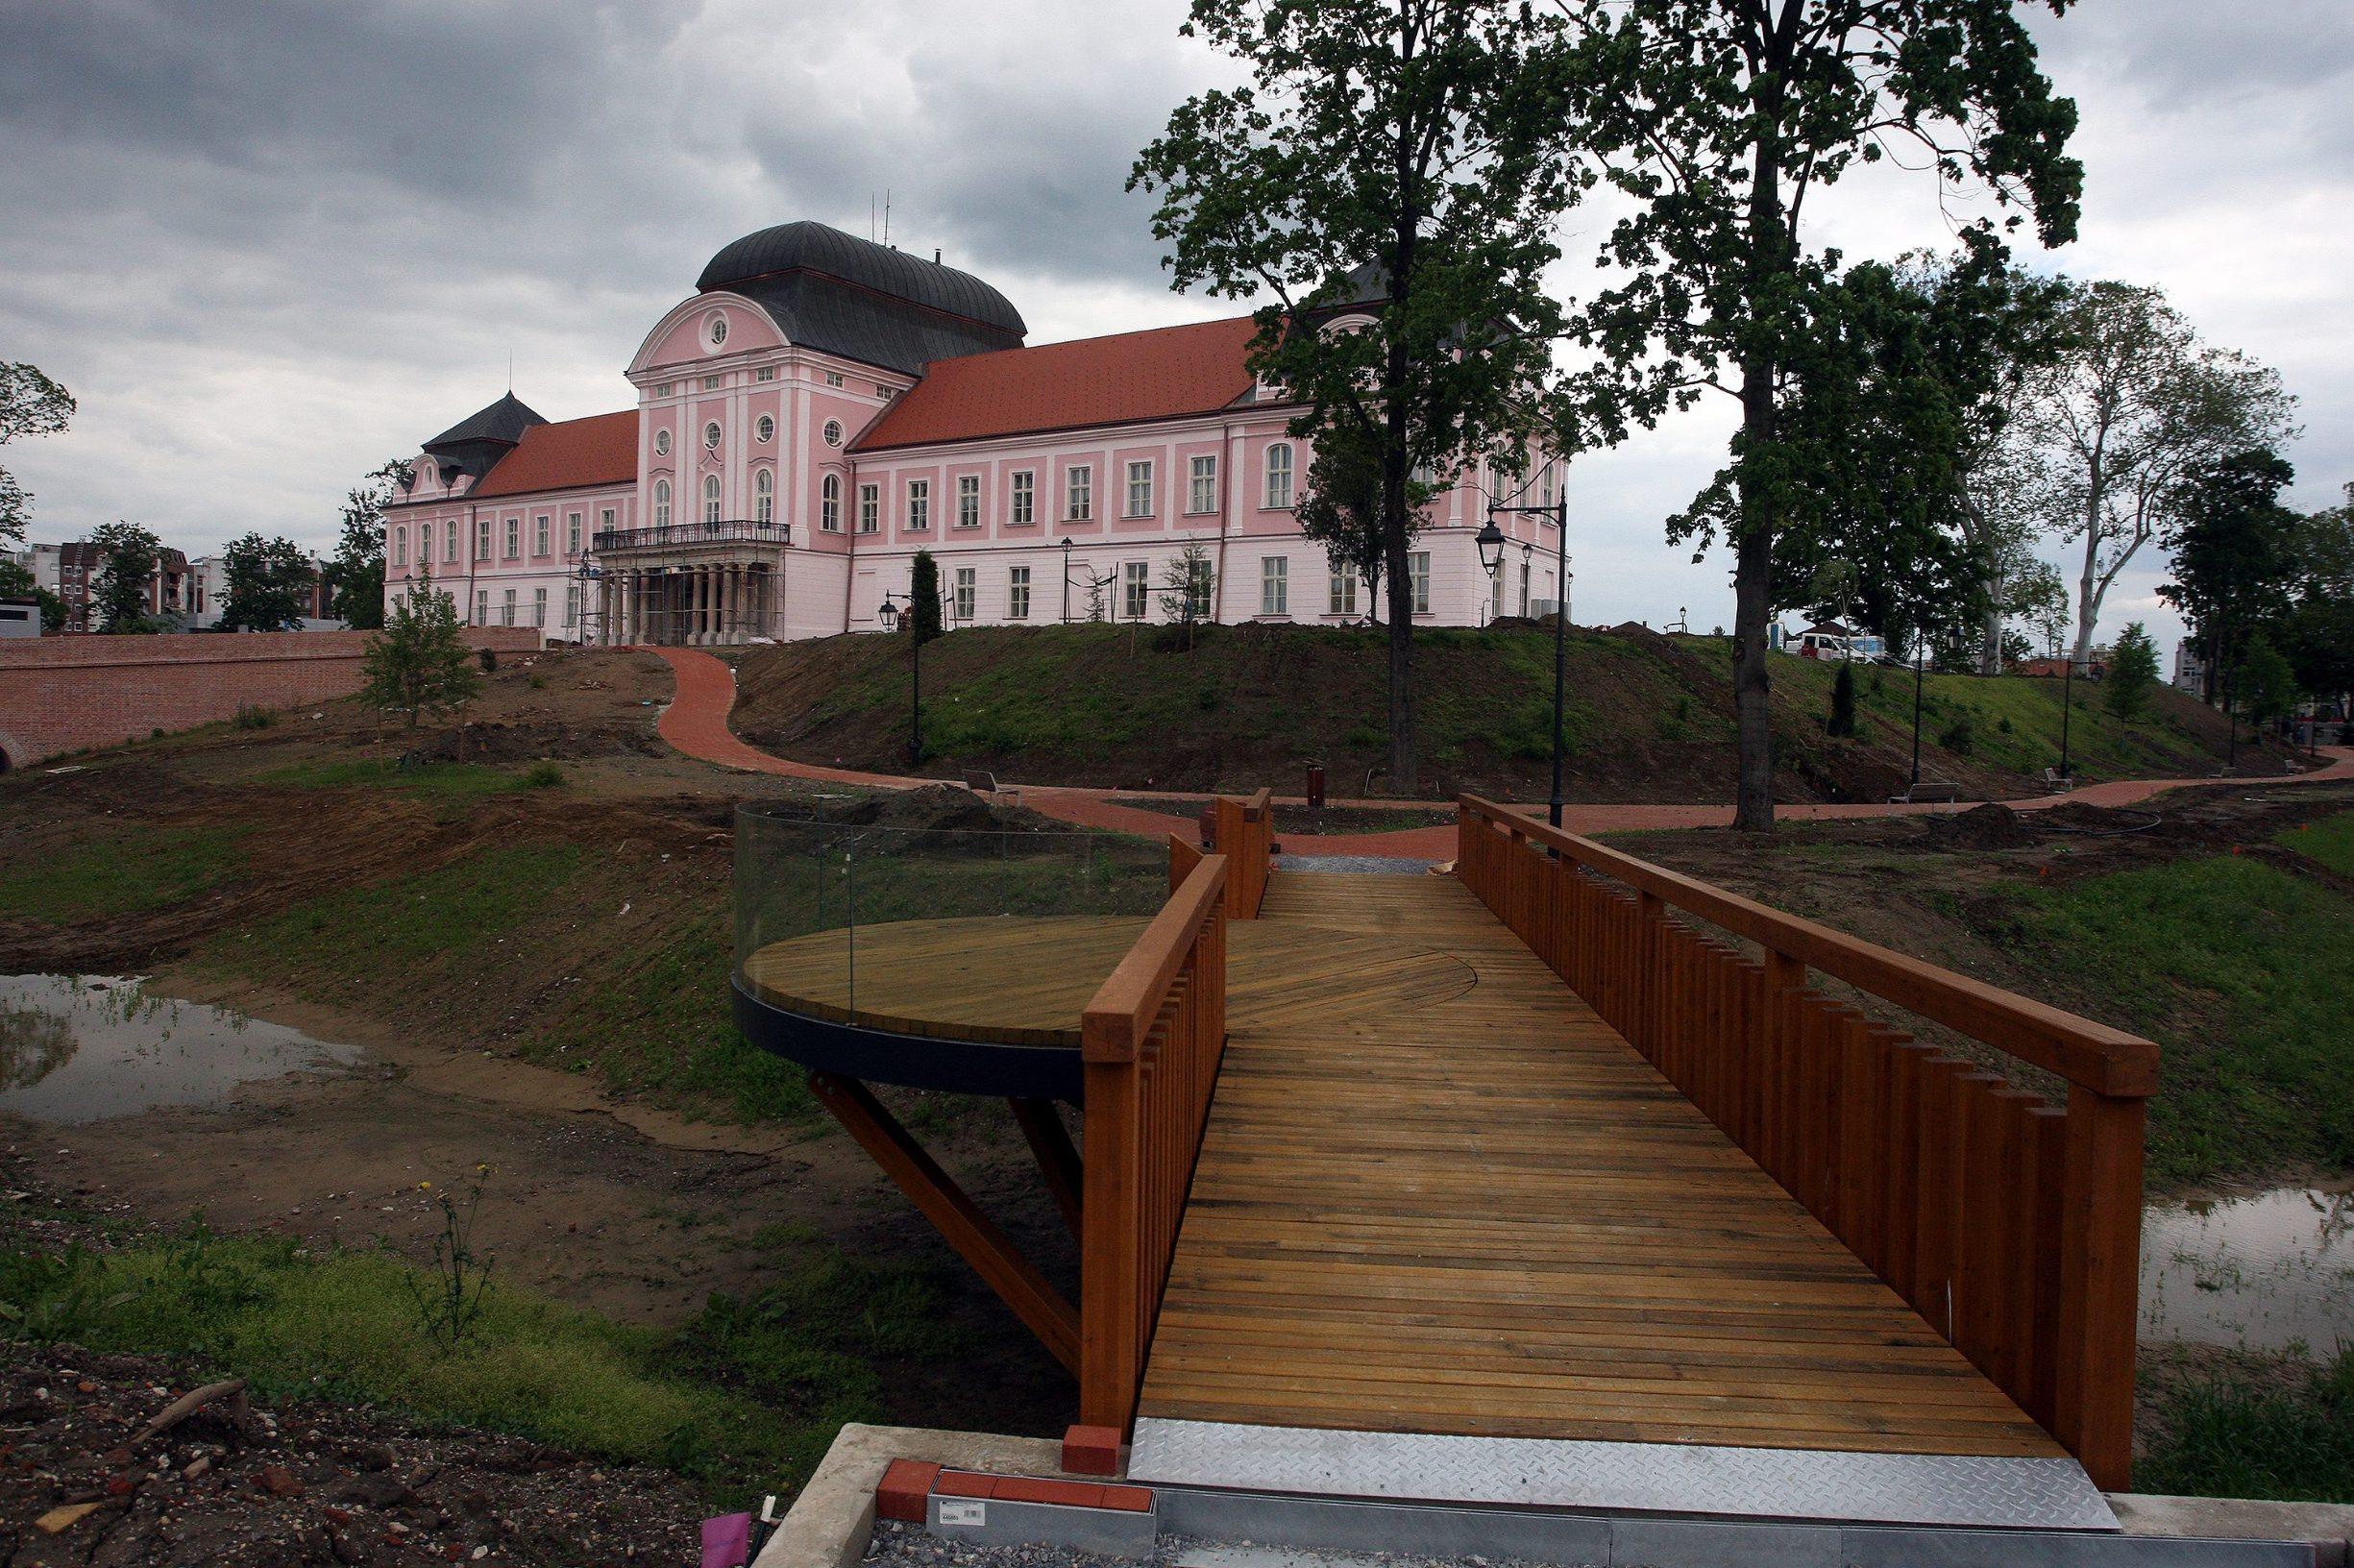 dvorac_pejacevic4-080519